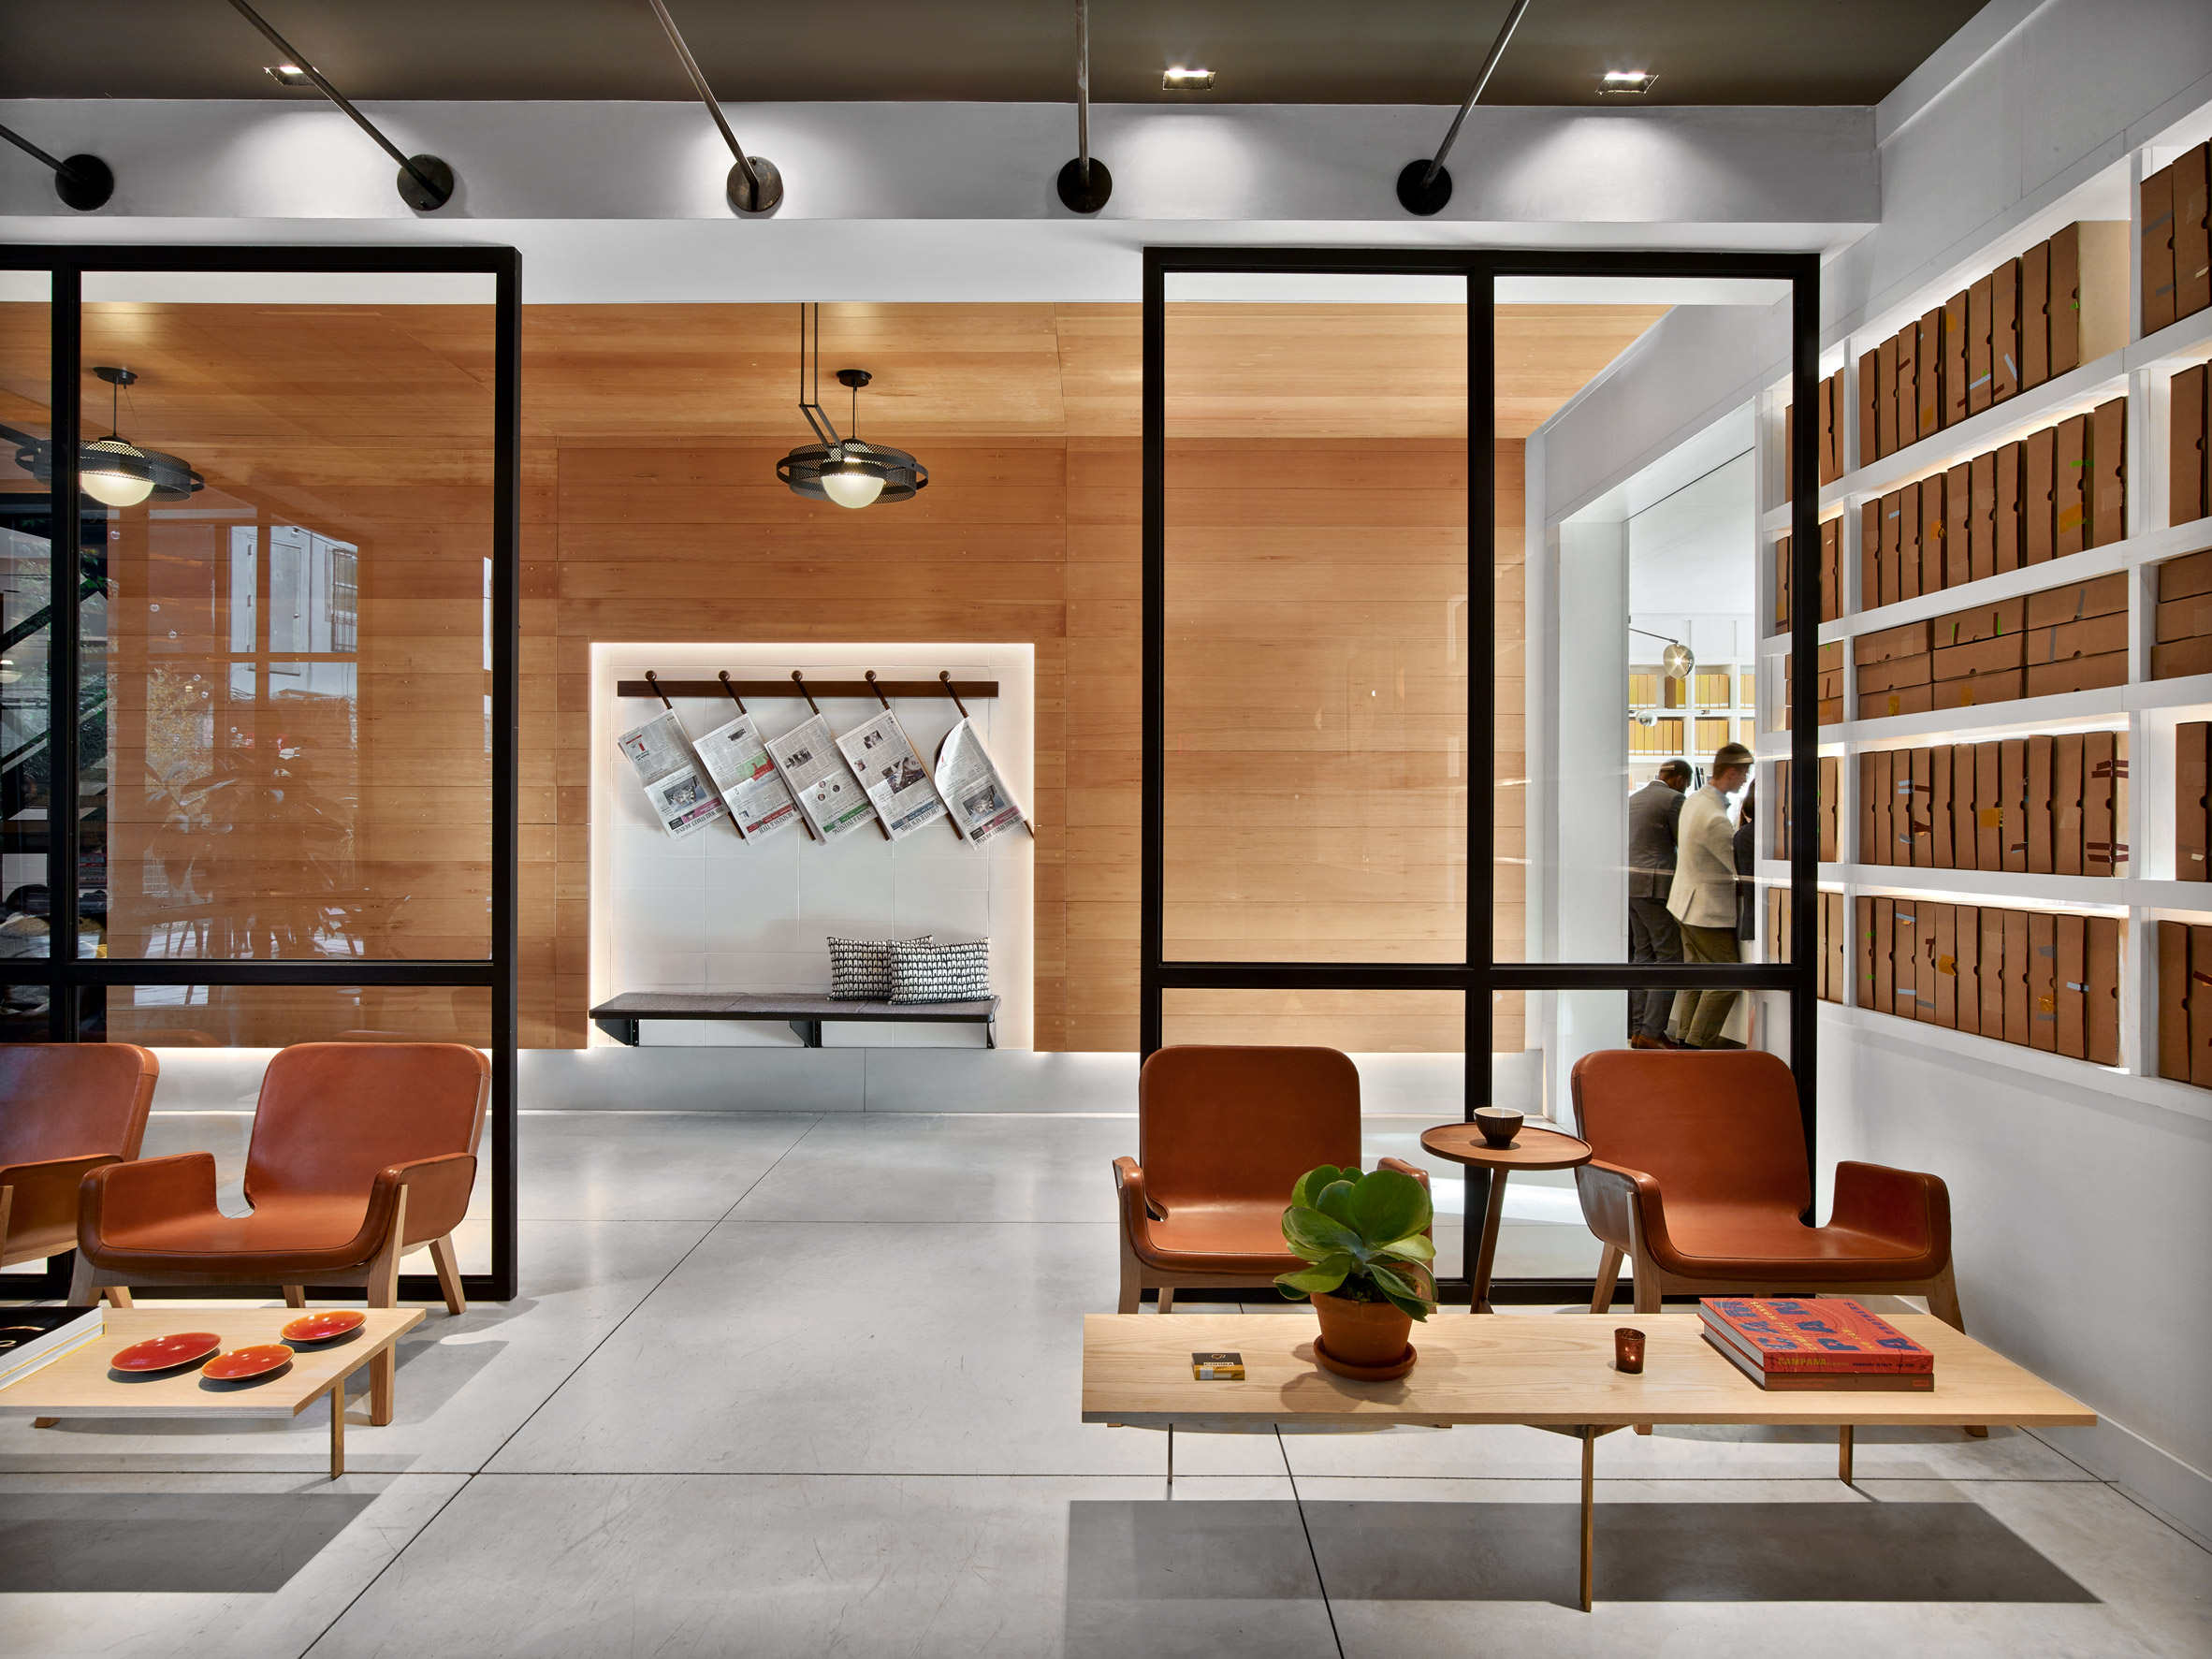 architecture-new-york-city-micro-hotel-design-studia-interiors-osnovadesign-osnova-poltava_07